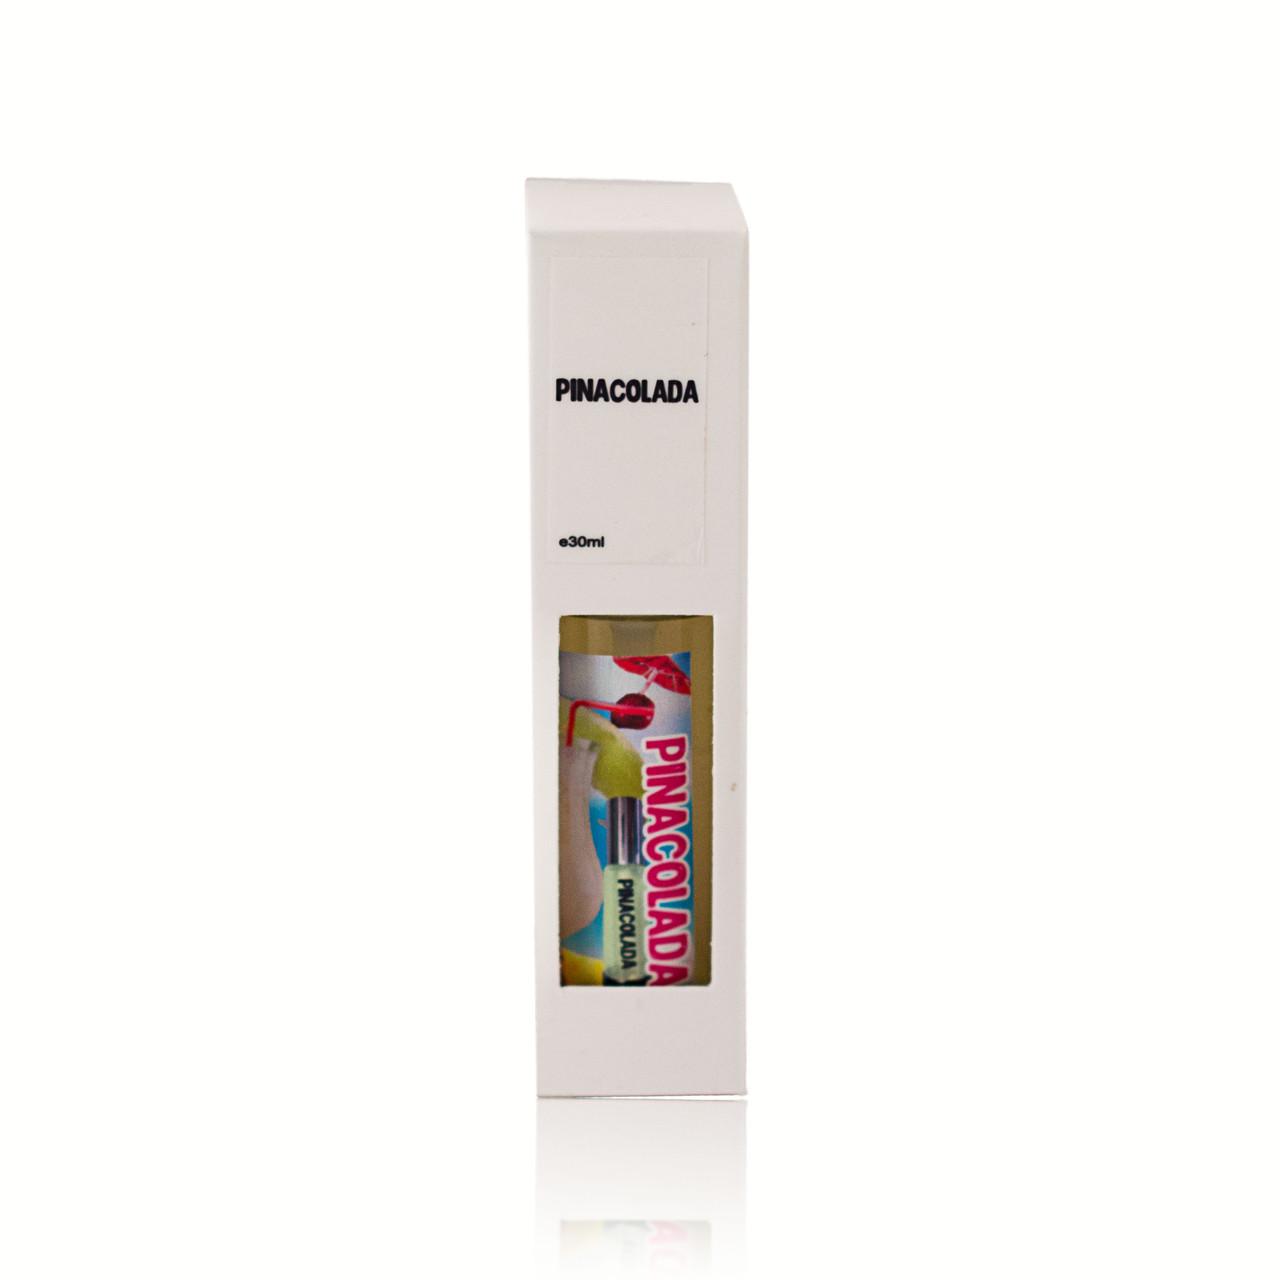 Pinacolada - Travel Perfume 30ml